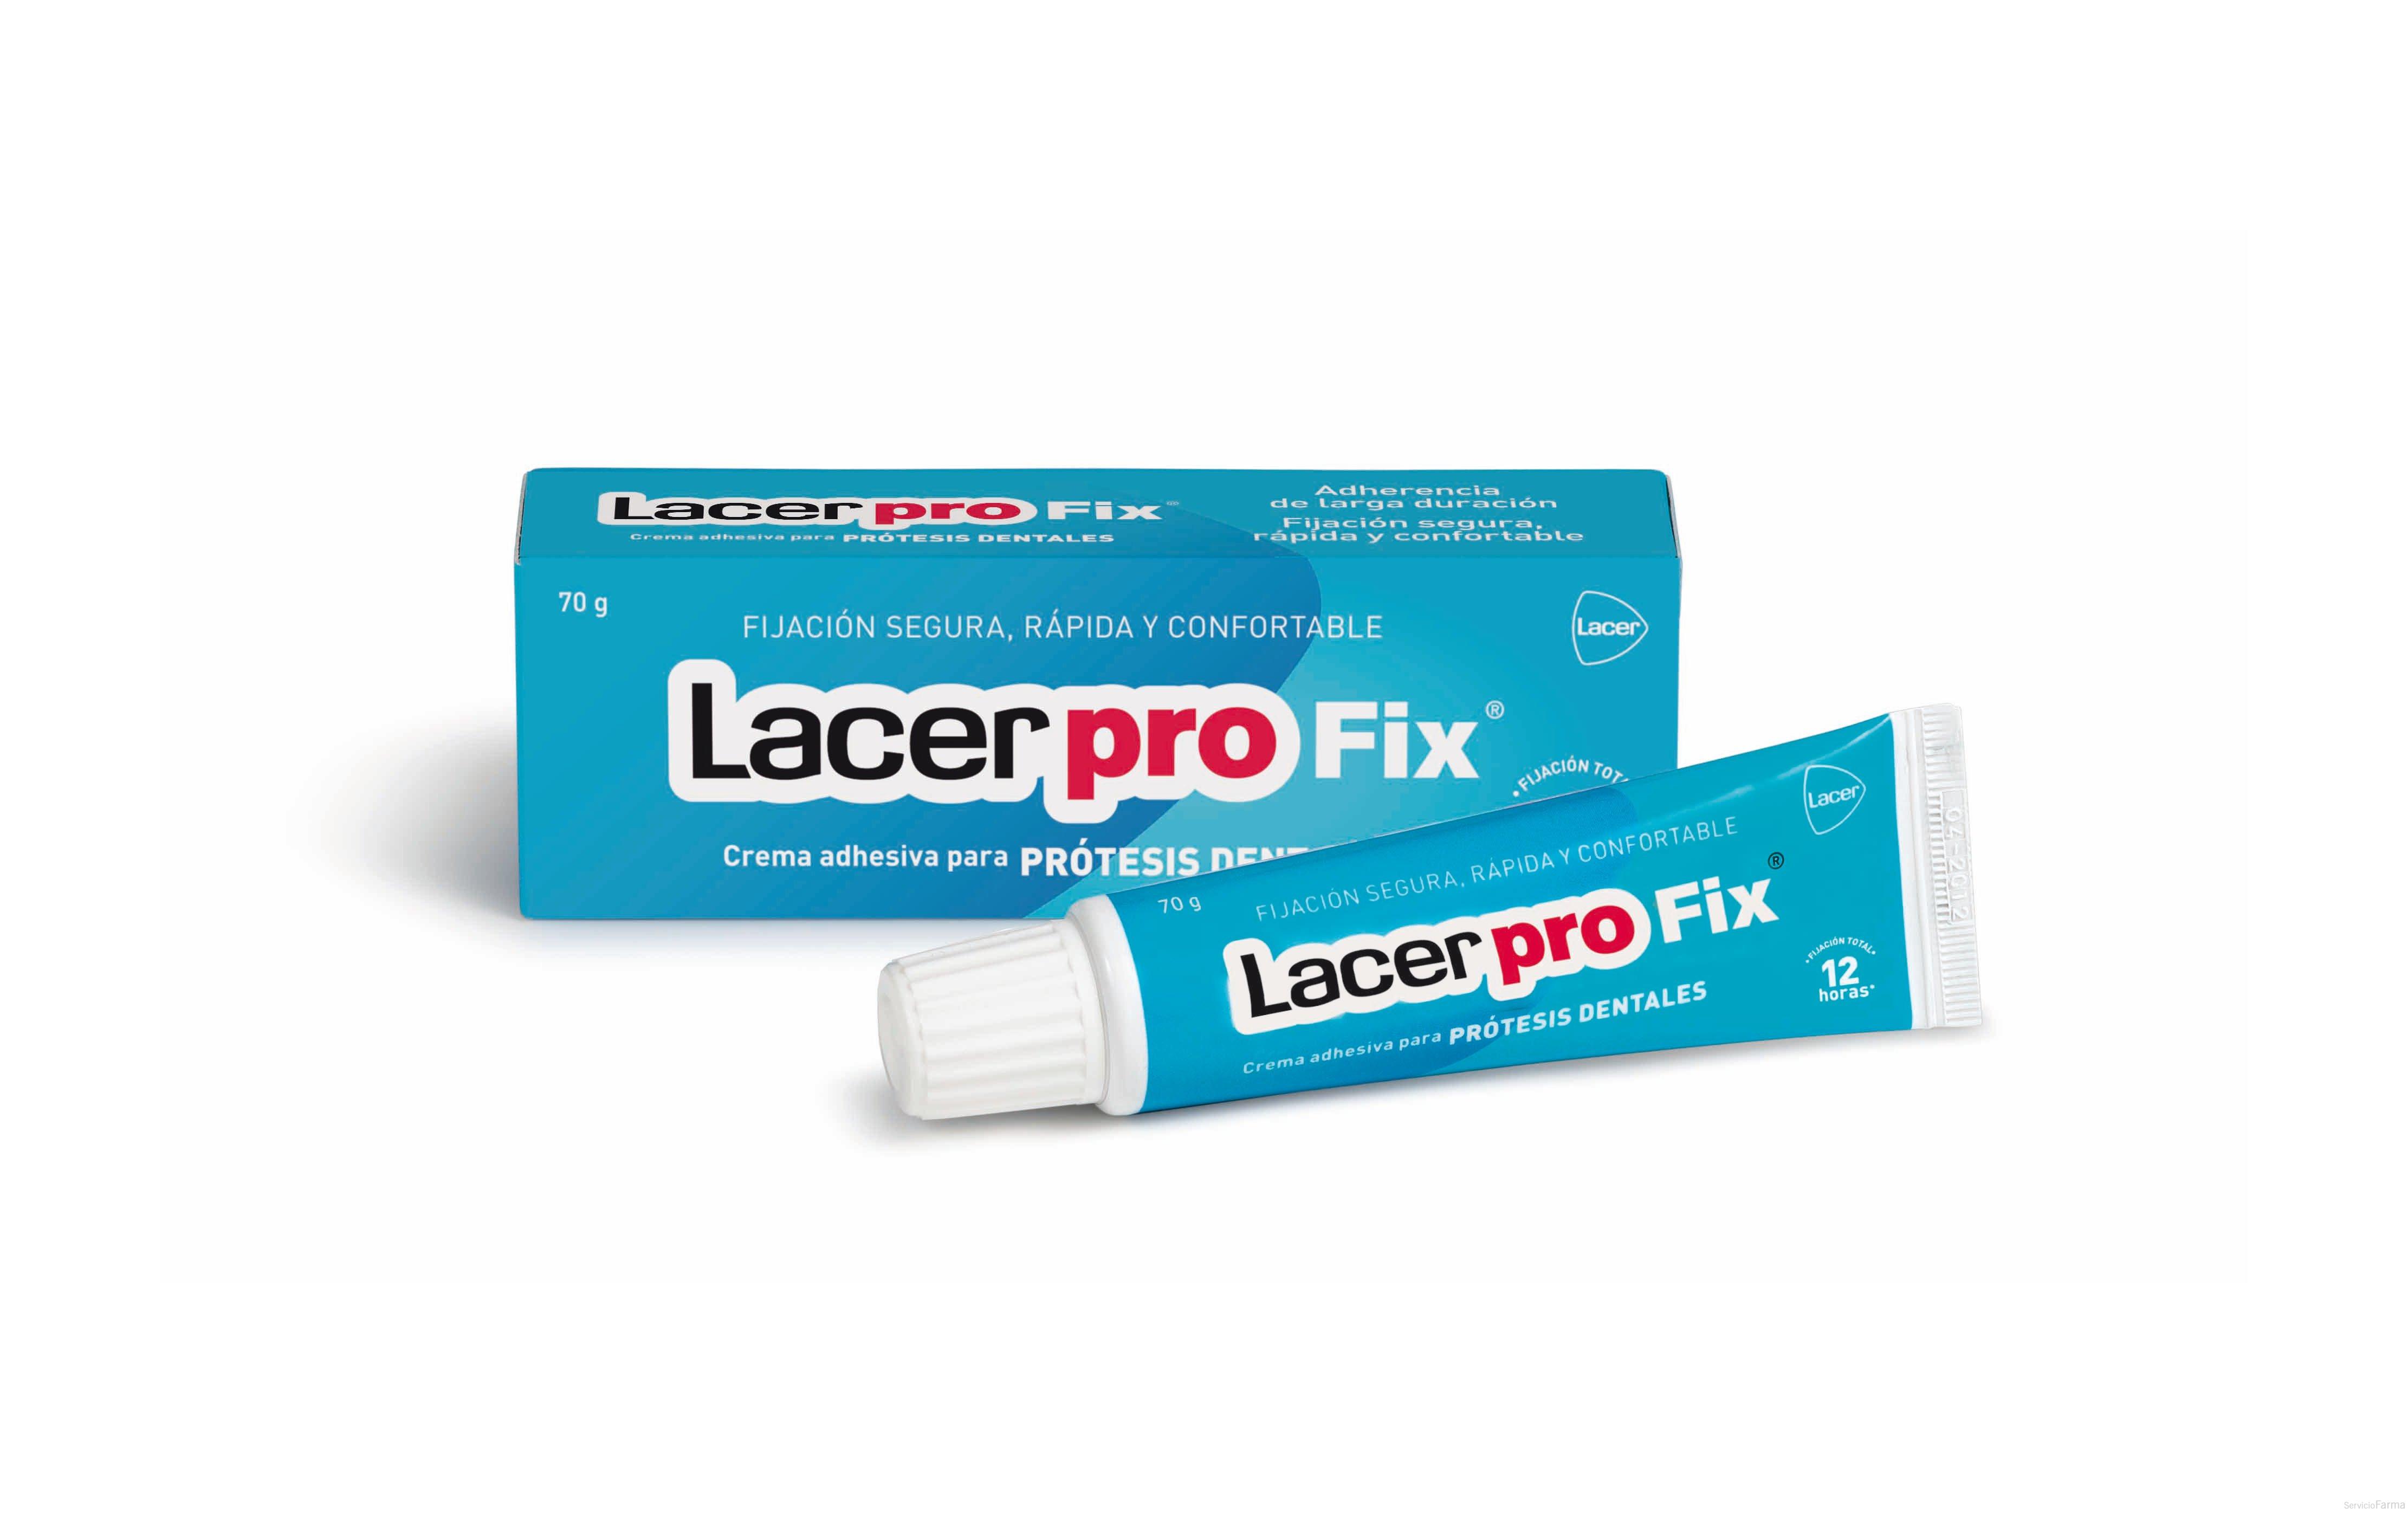 Lacer Pro Fix crema adhesiva 70 g